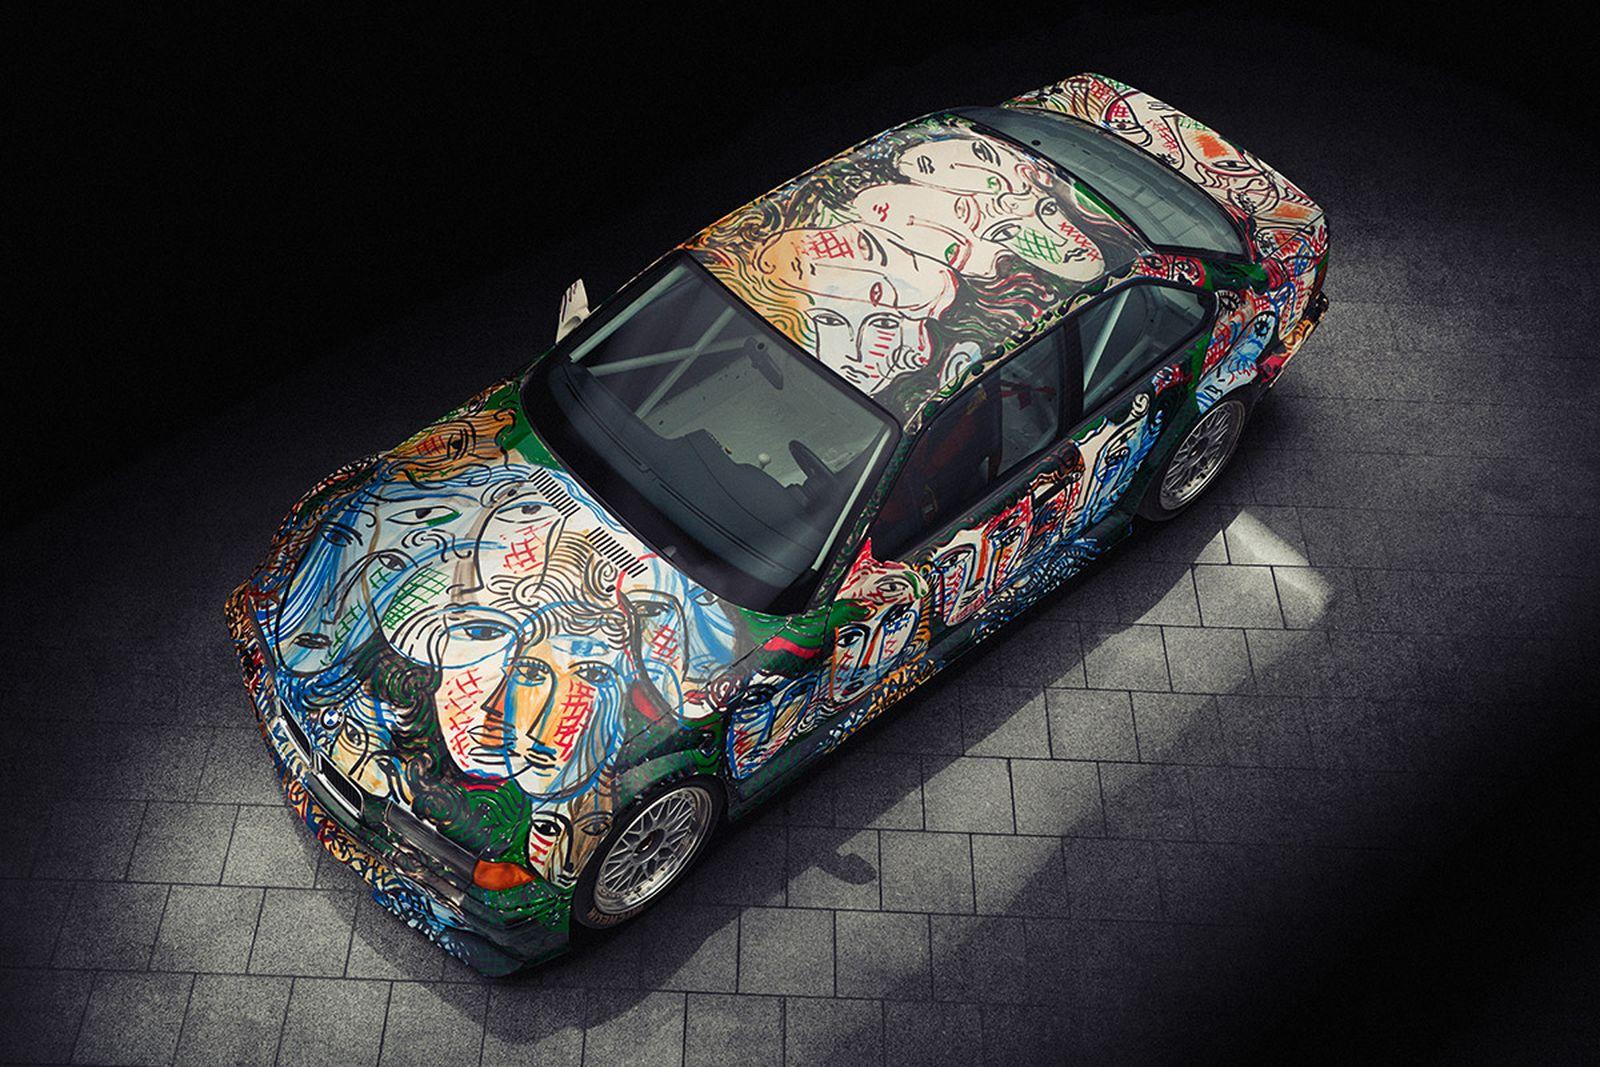 BMW Art Car 13, Sandro Chia, 1992